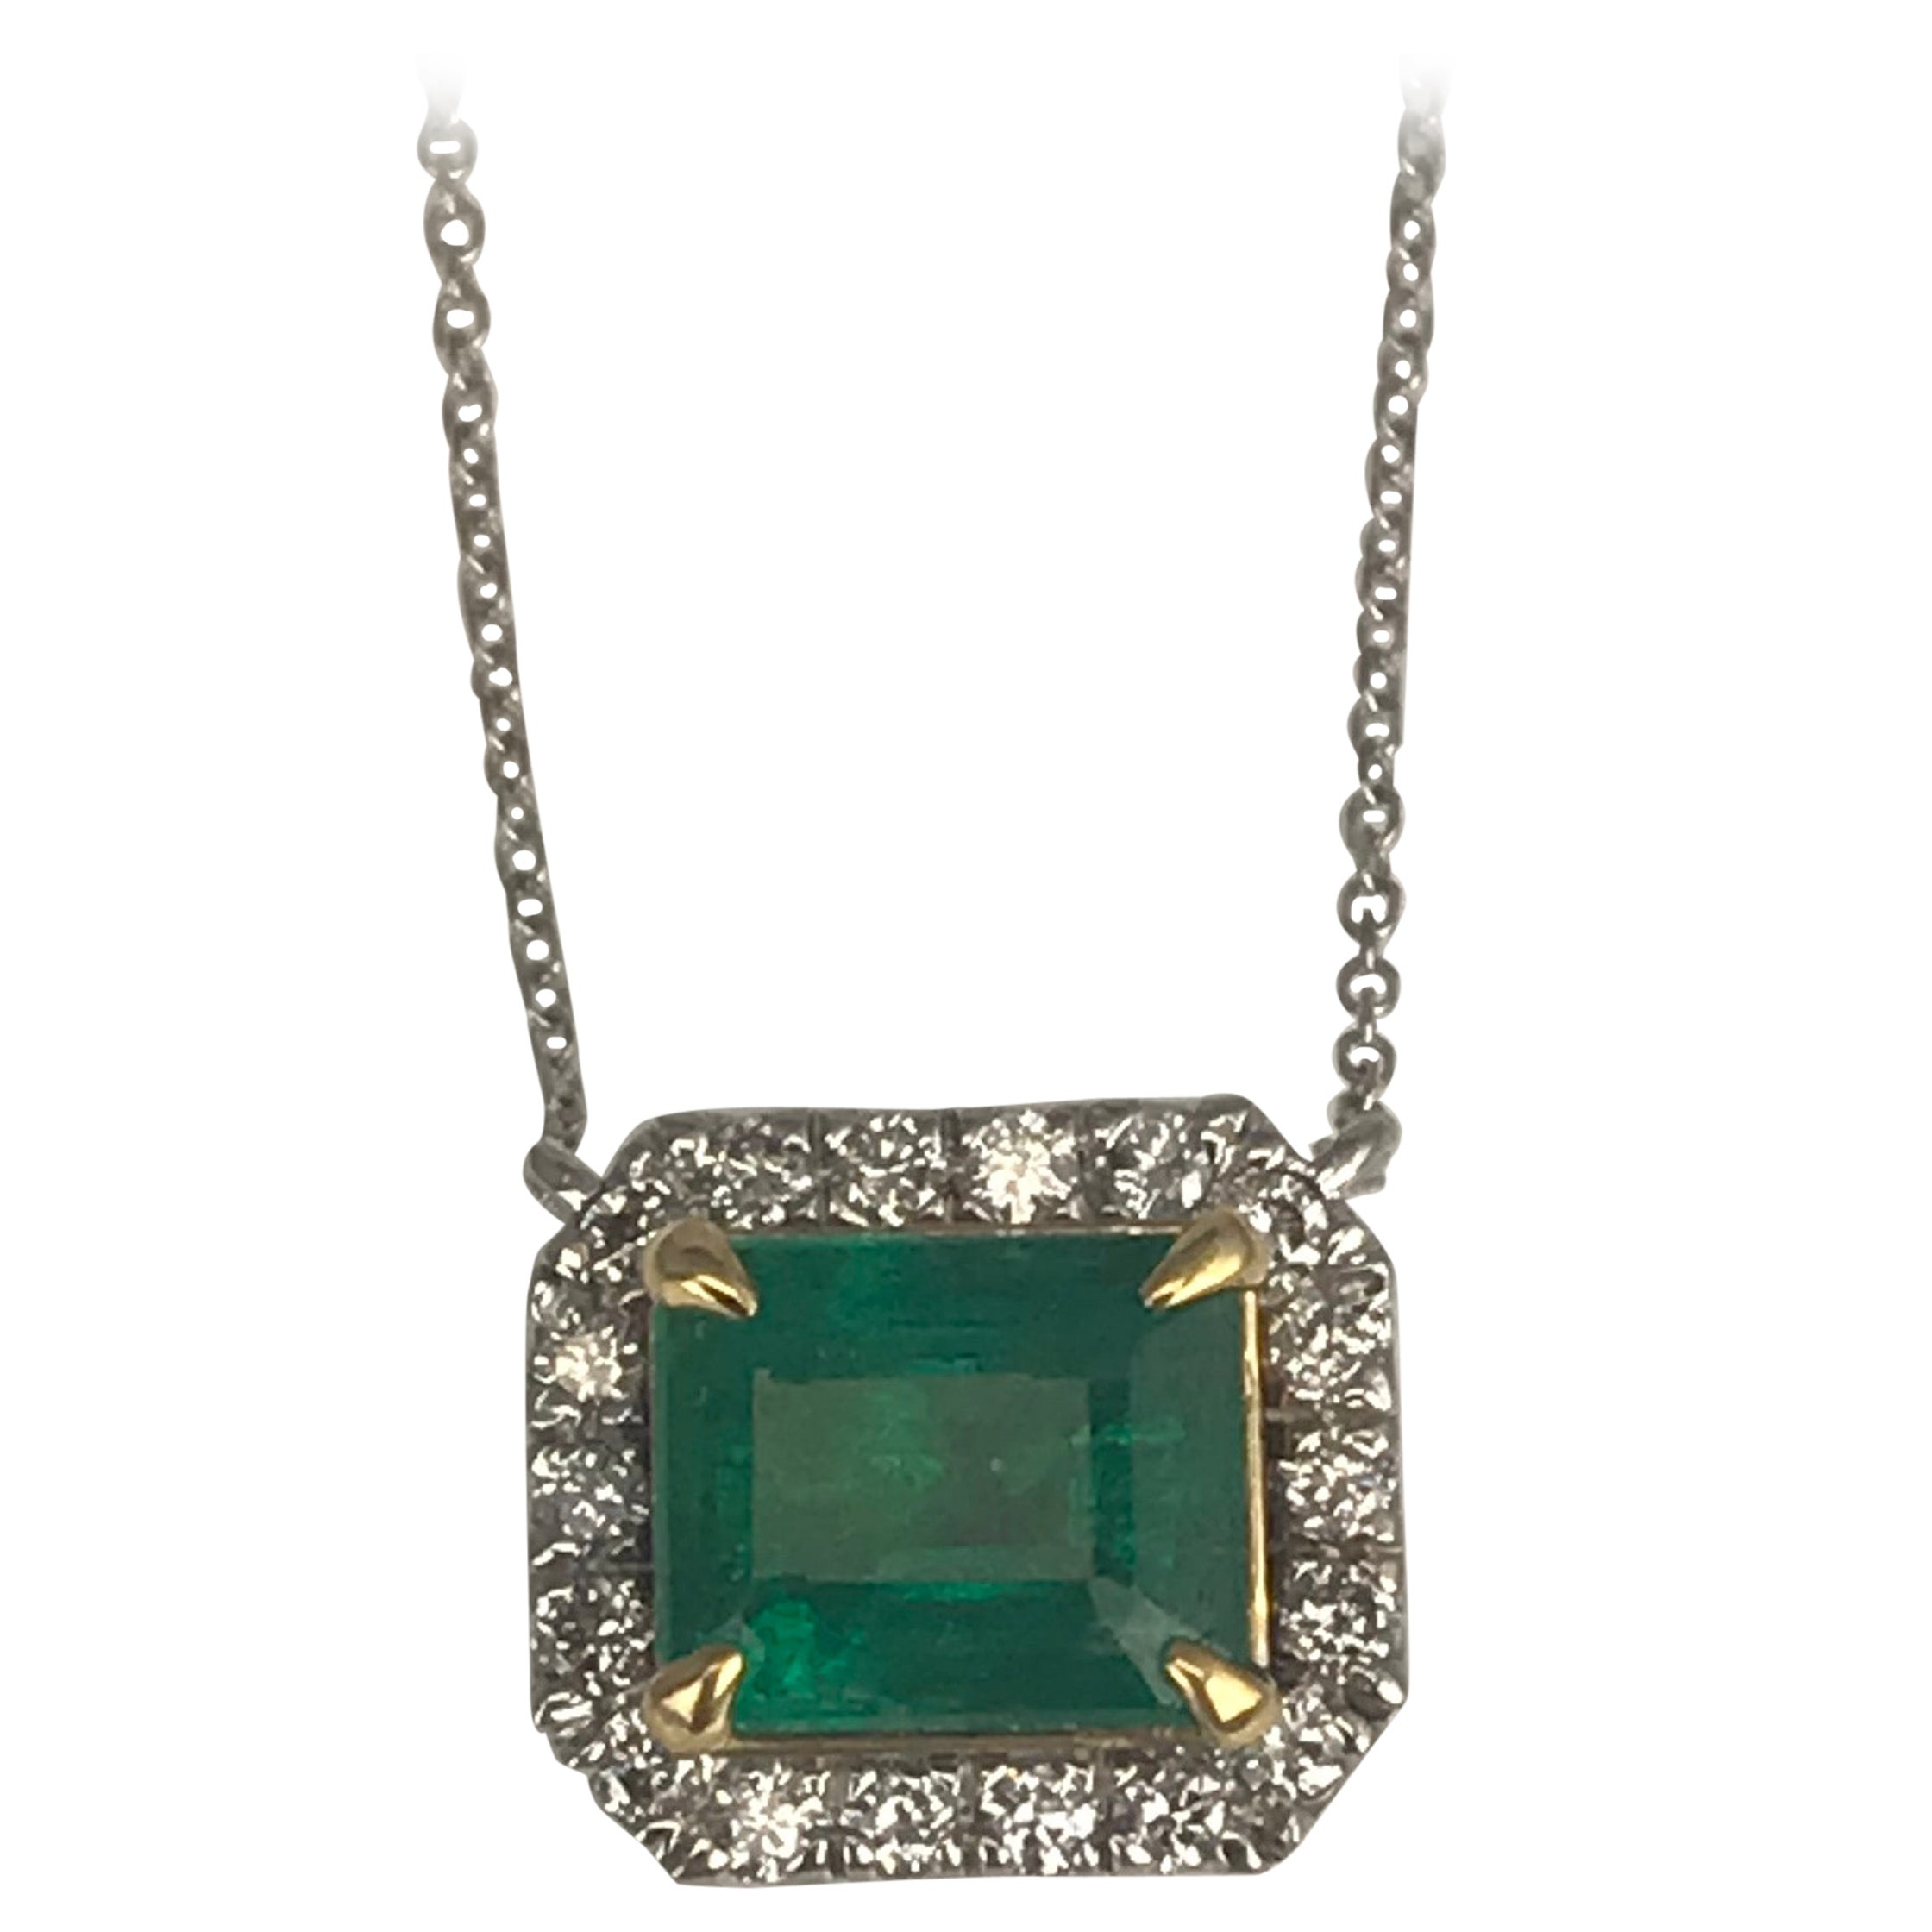 DiamondTown 2.33 Carat Emerald Cut Emerald Pendant with 0.32 Carat Diamond Halo